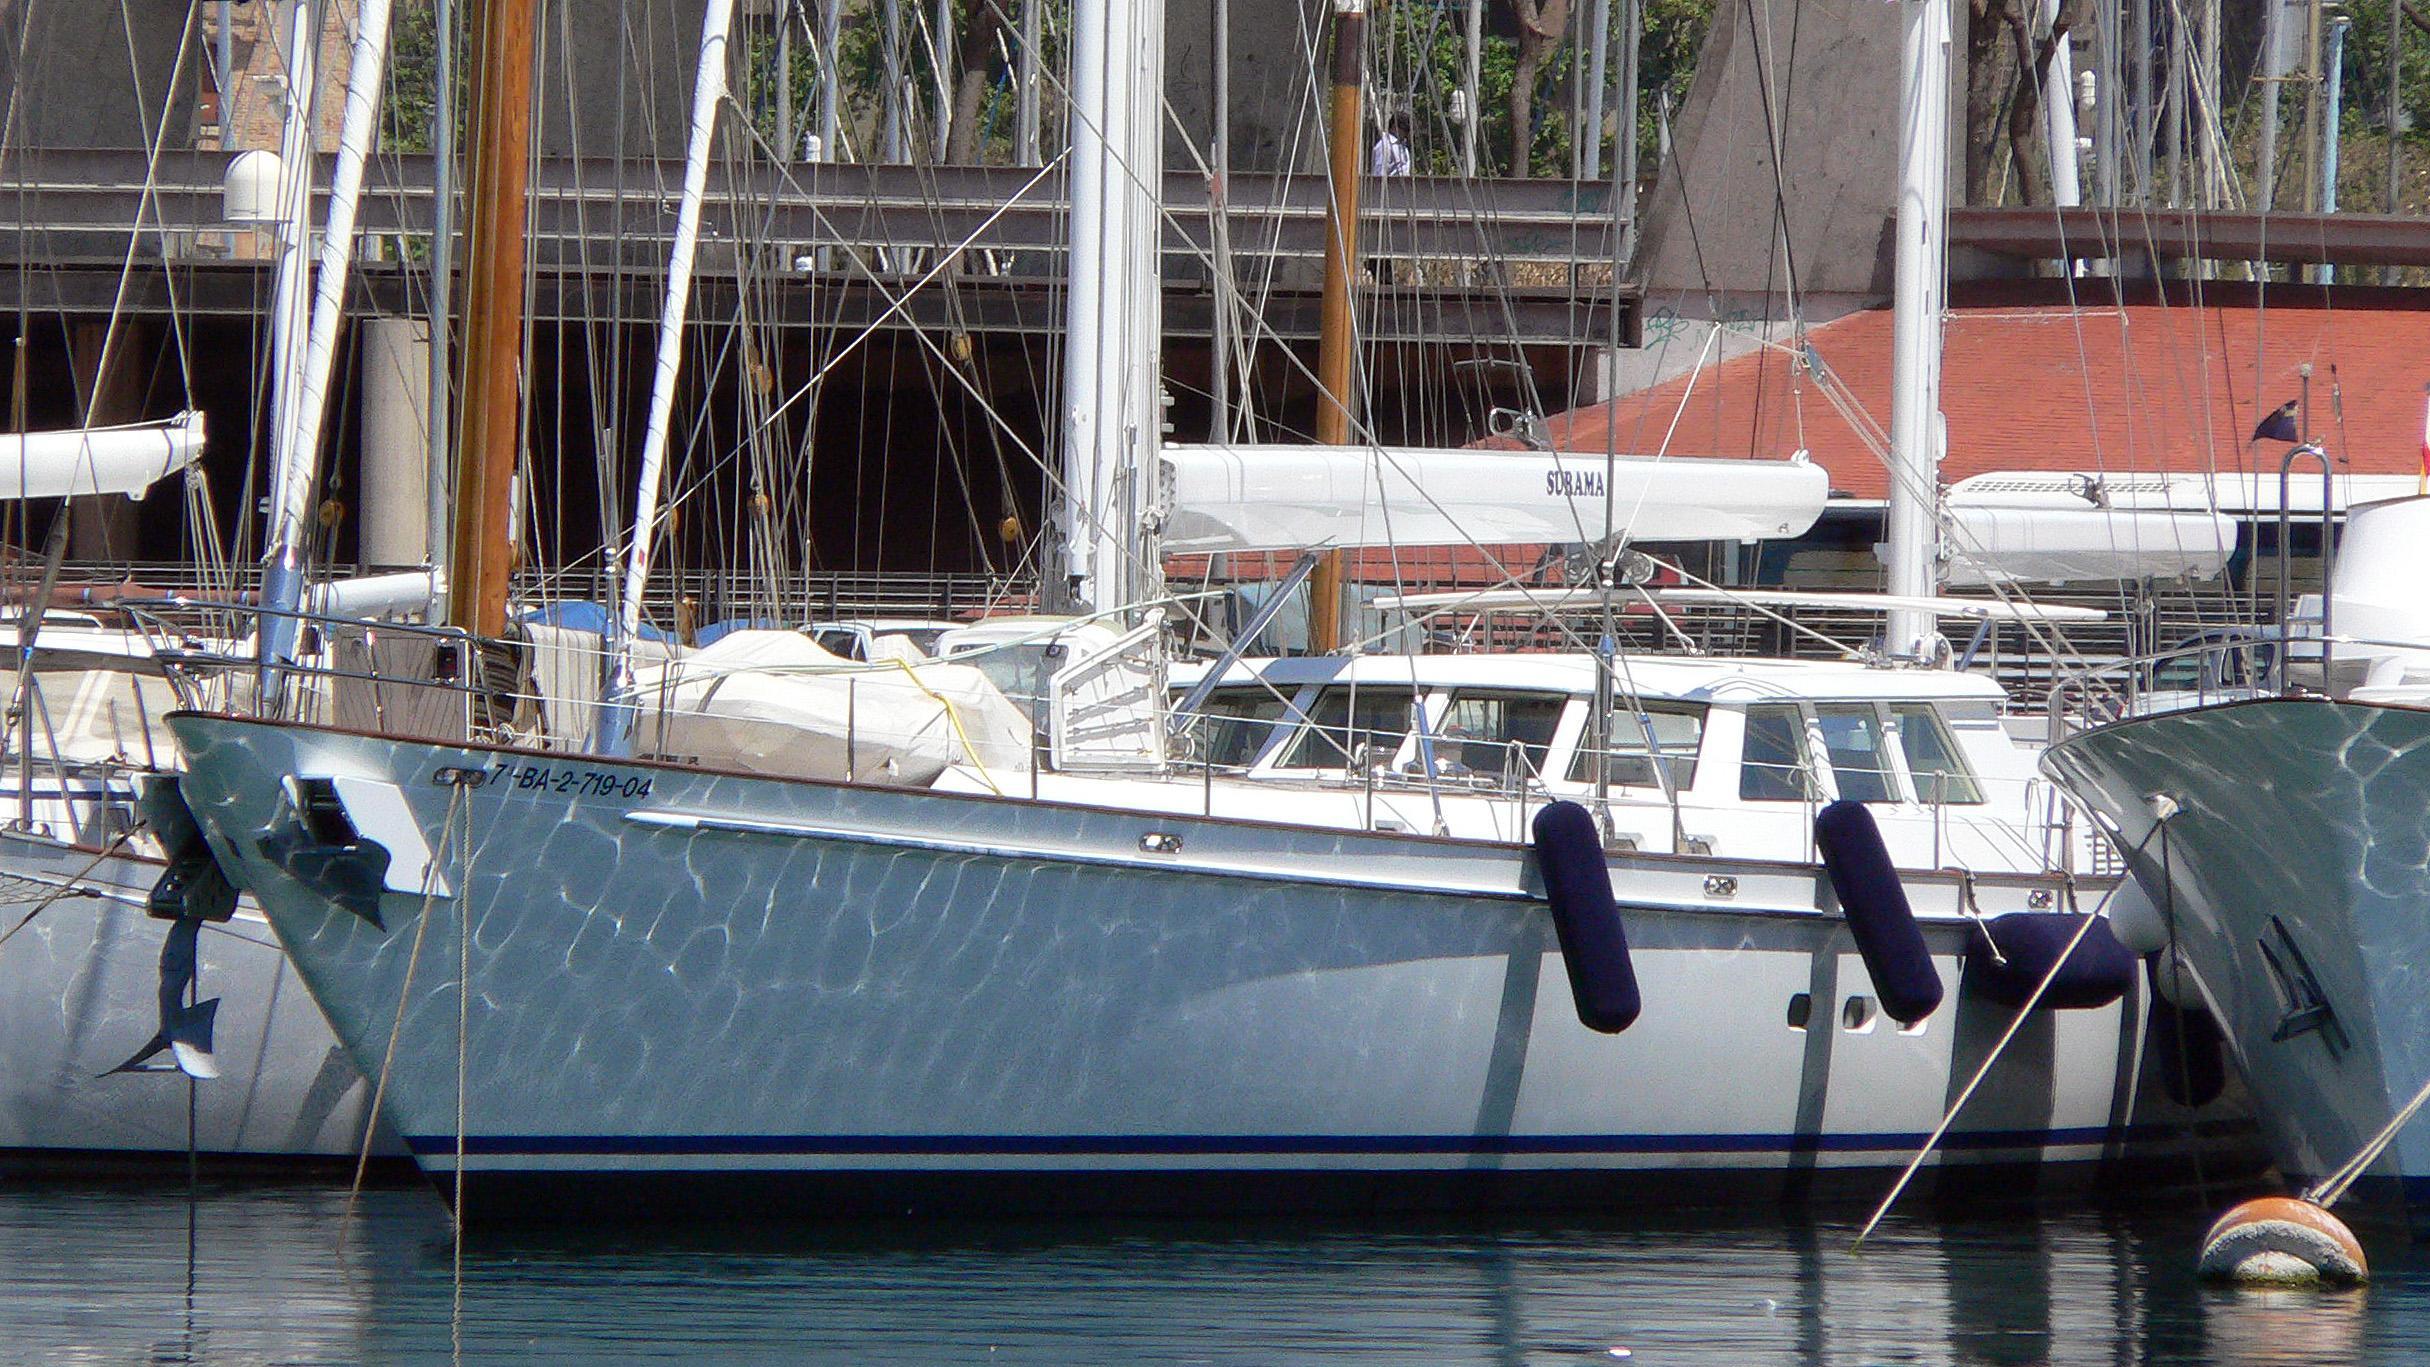 surama-sailing-yacht-royal-huisman-1997-41m-half-profile-before-refit